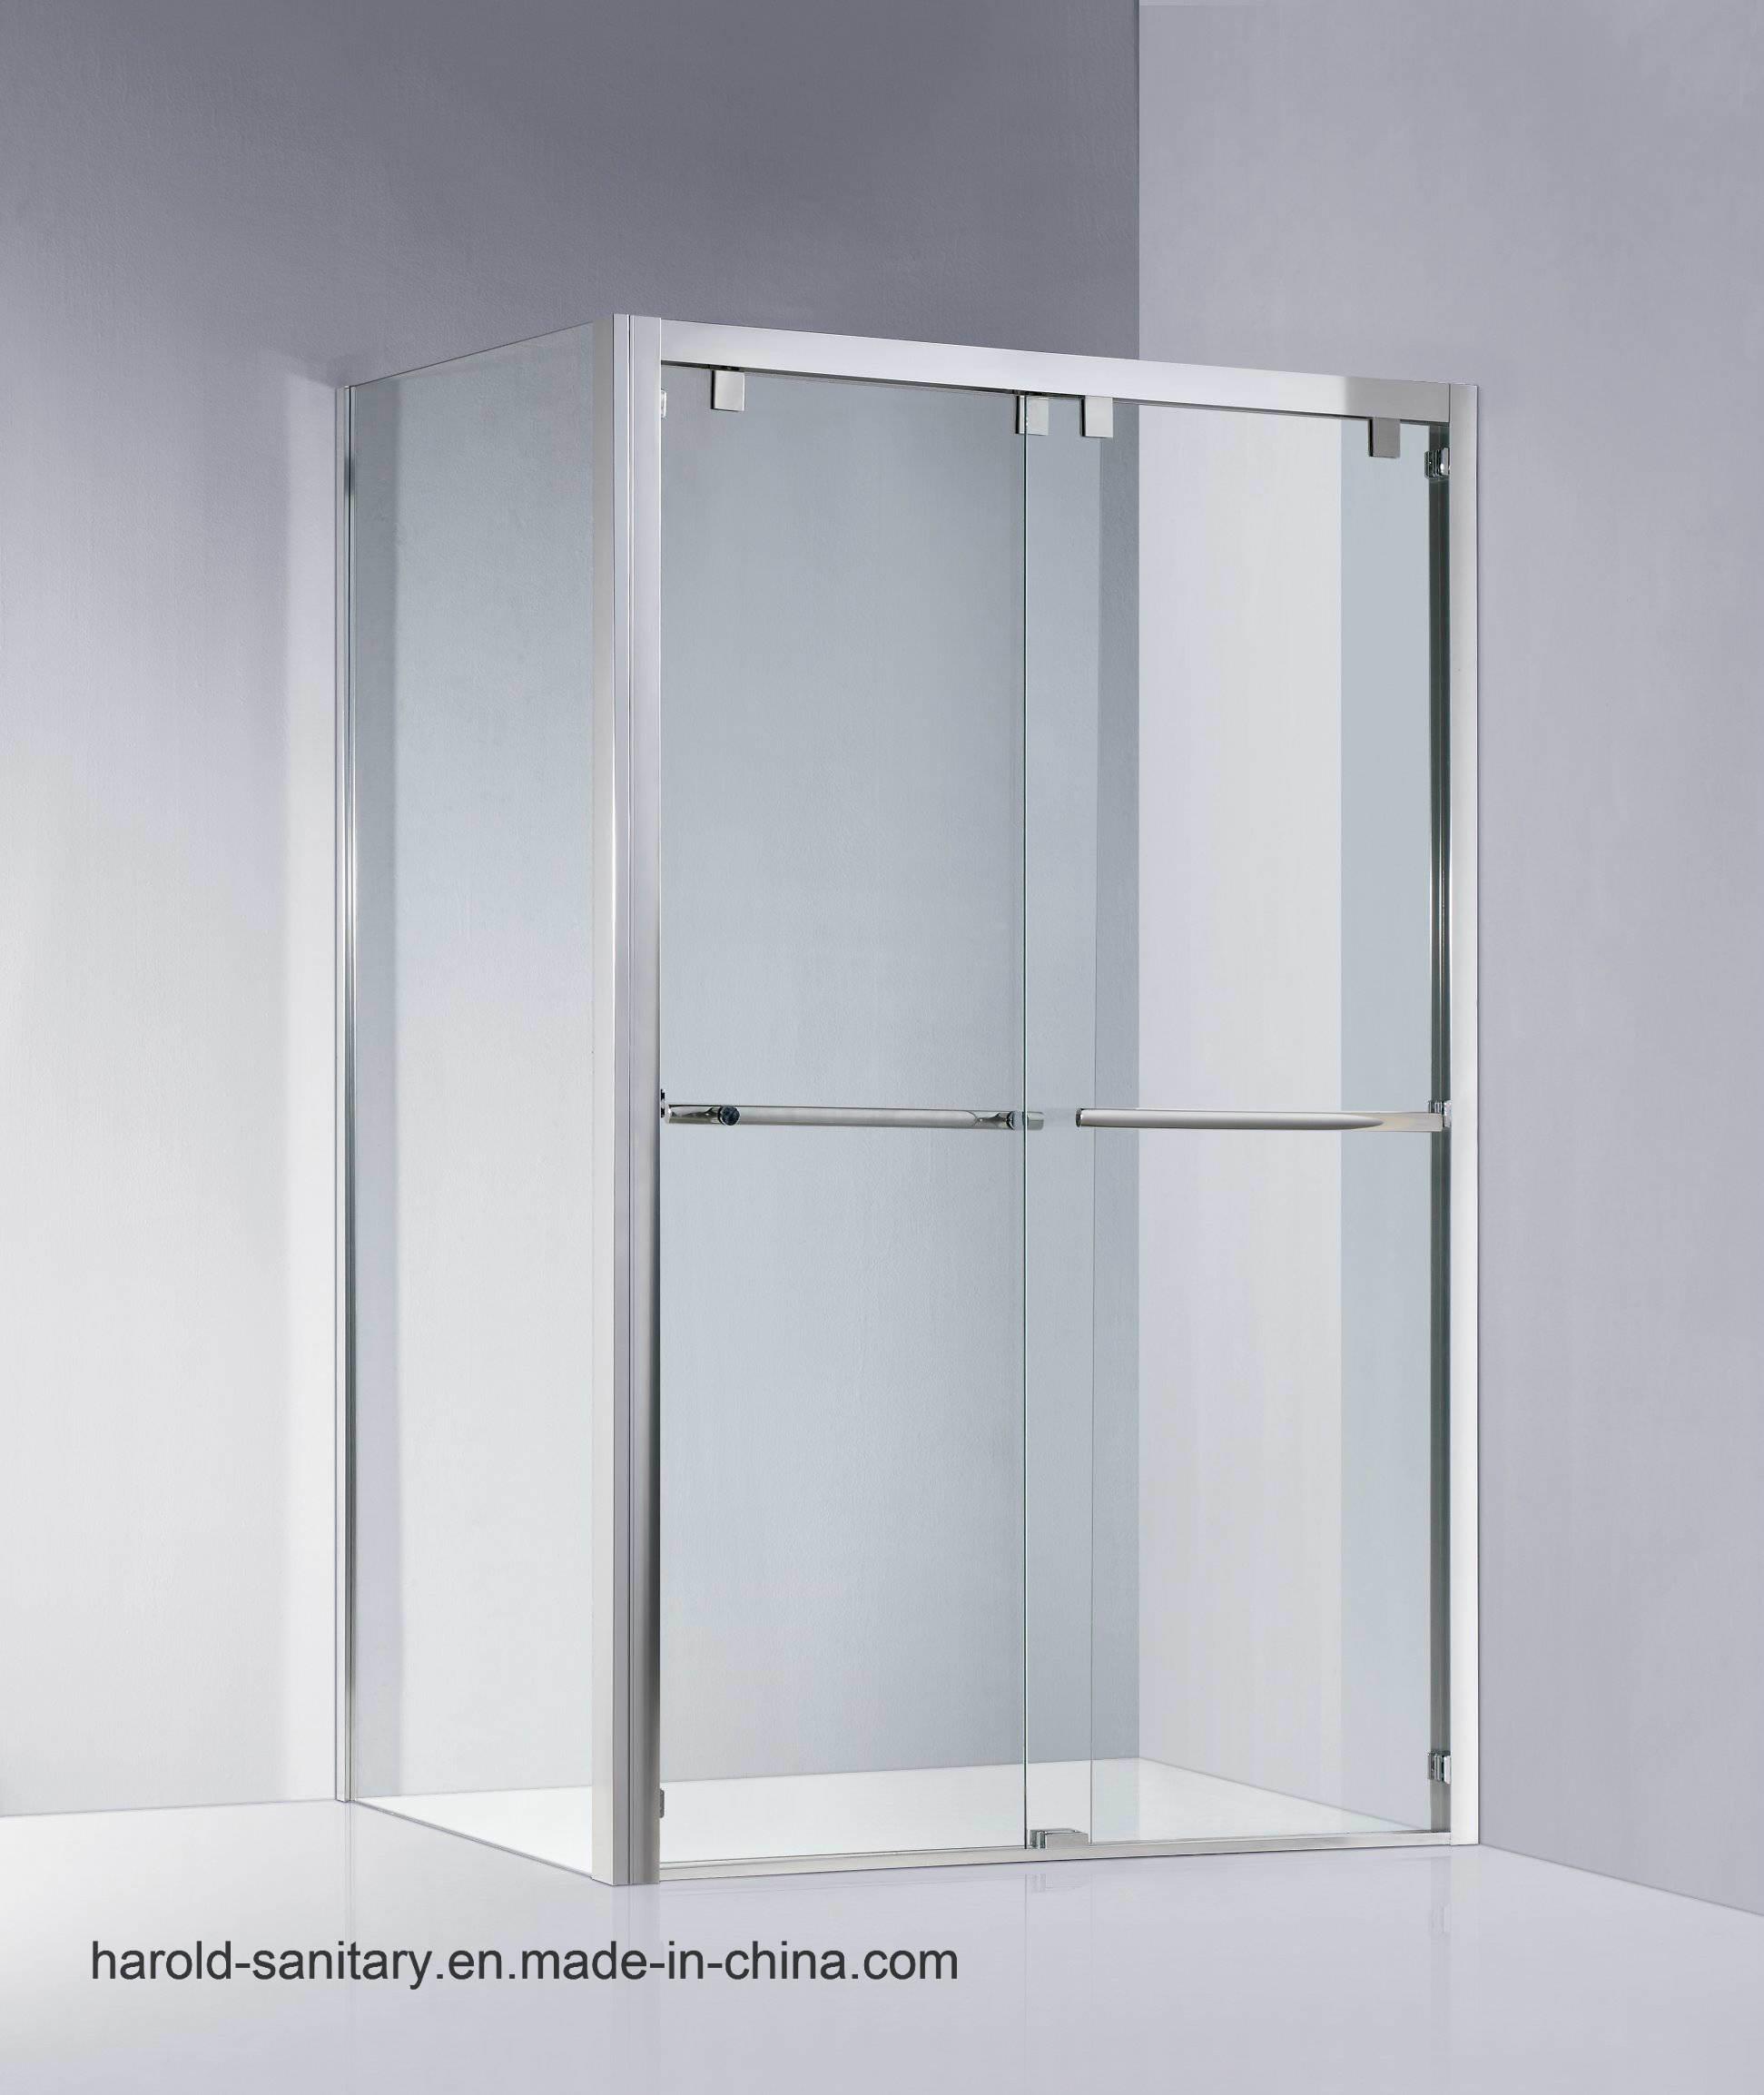 Stainless Steel Framed Double Sliding Shower Enclosure